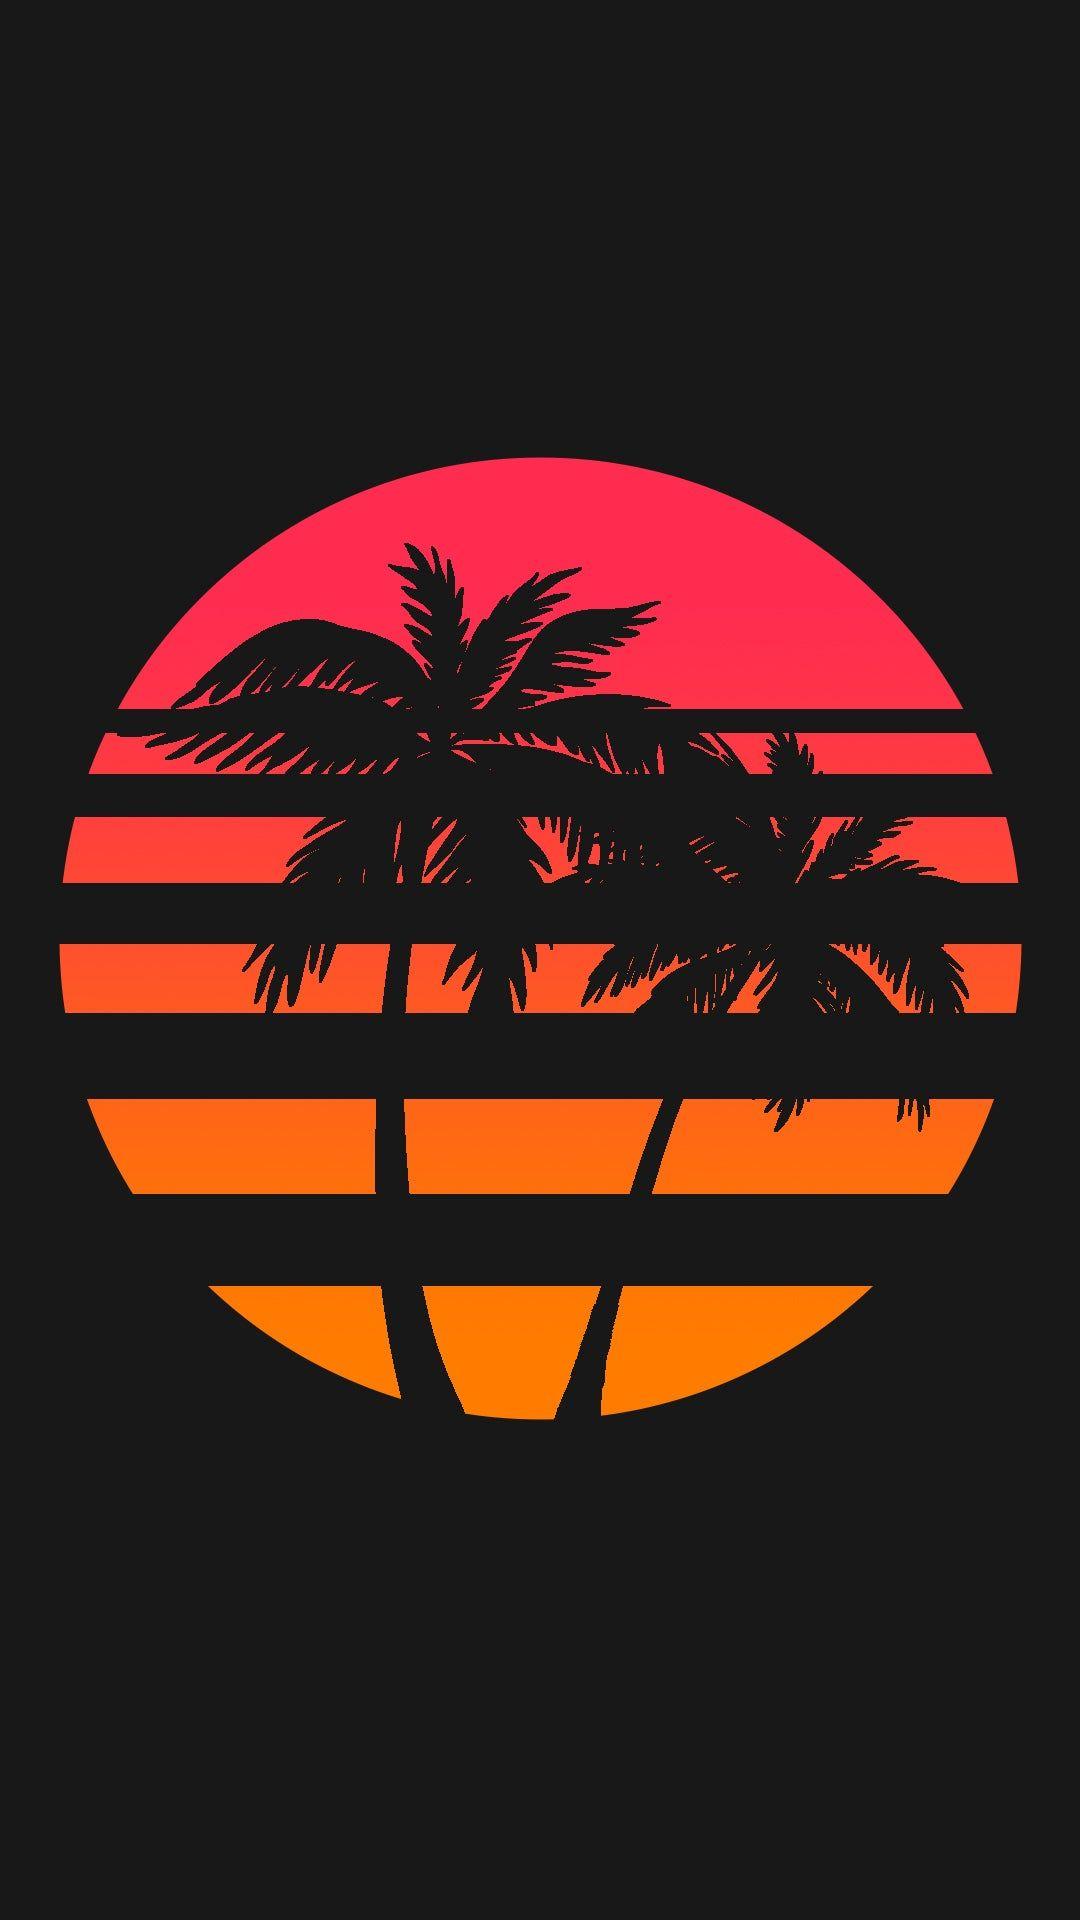 1080x1920] Retrowave Palm Sun Black phone wallpaper Phone 1080x1920